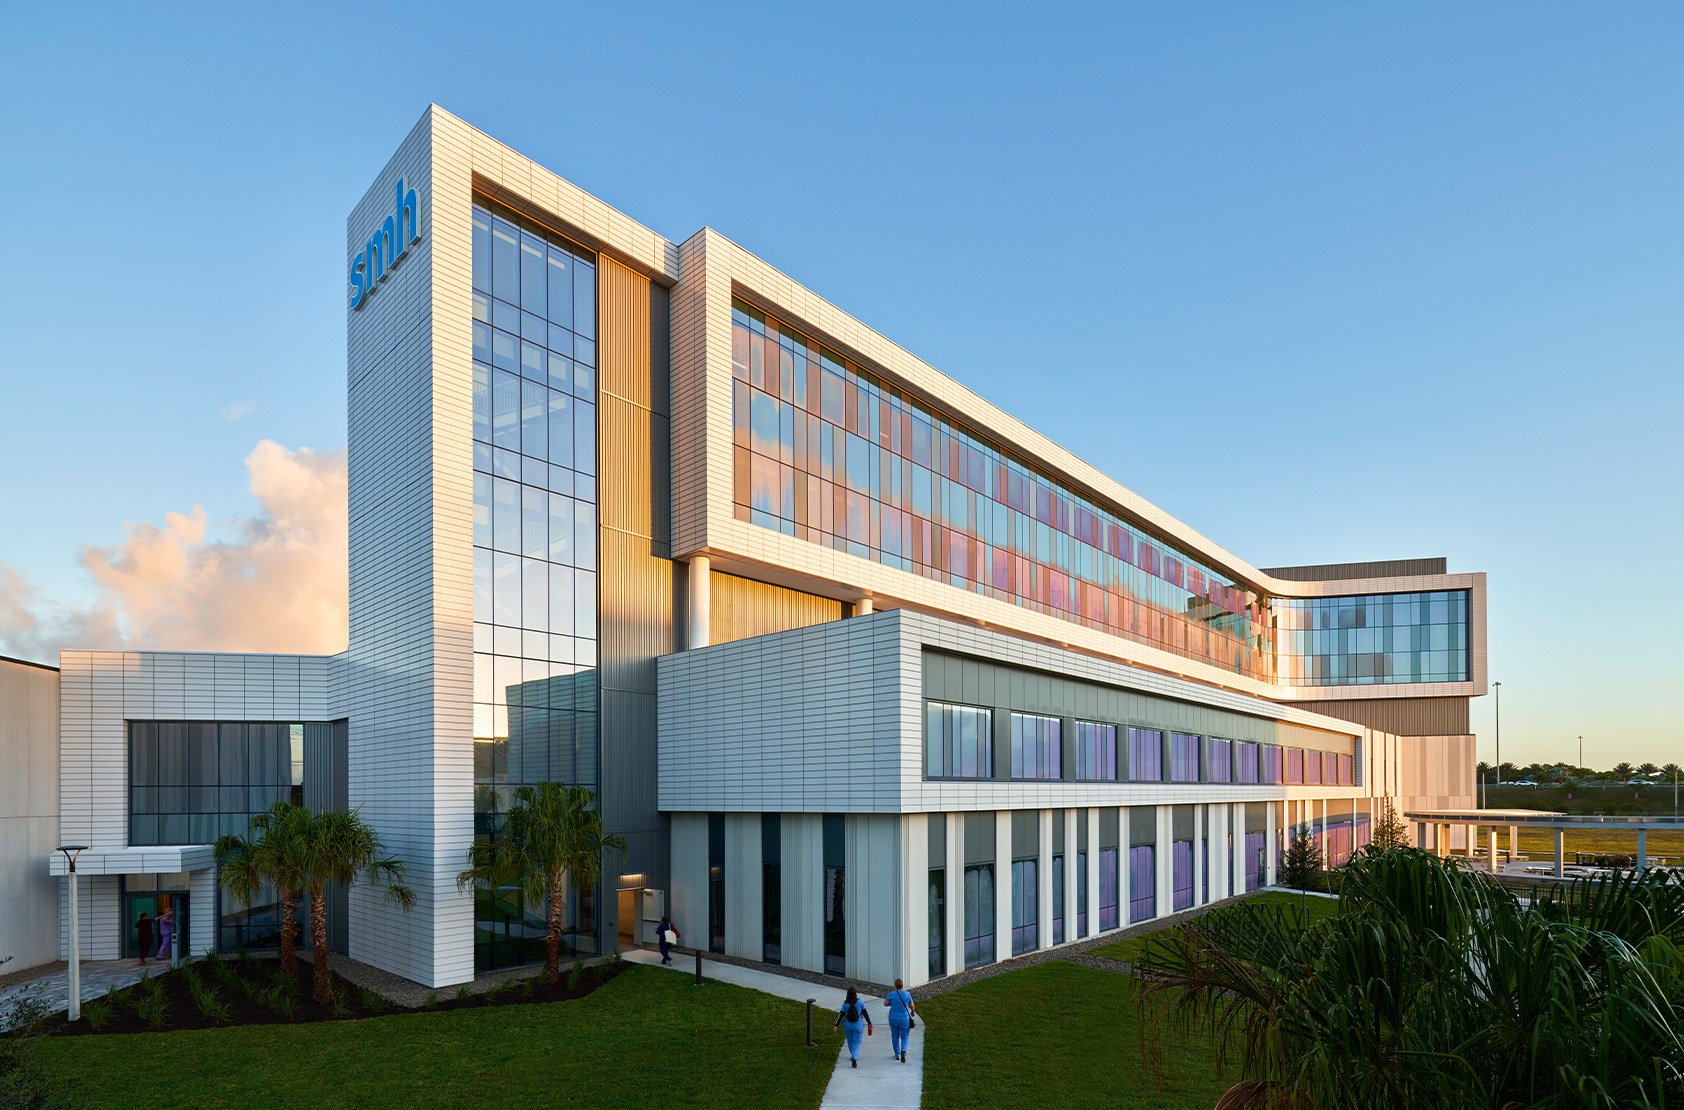 Sarasota Memorial Hospital - Venice Campus